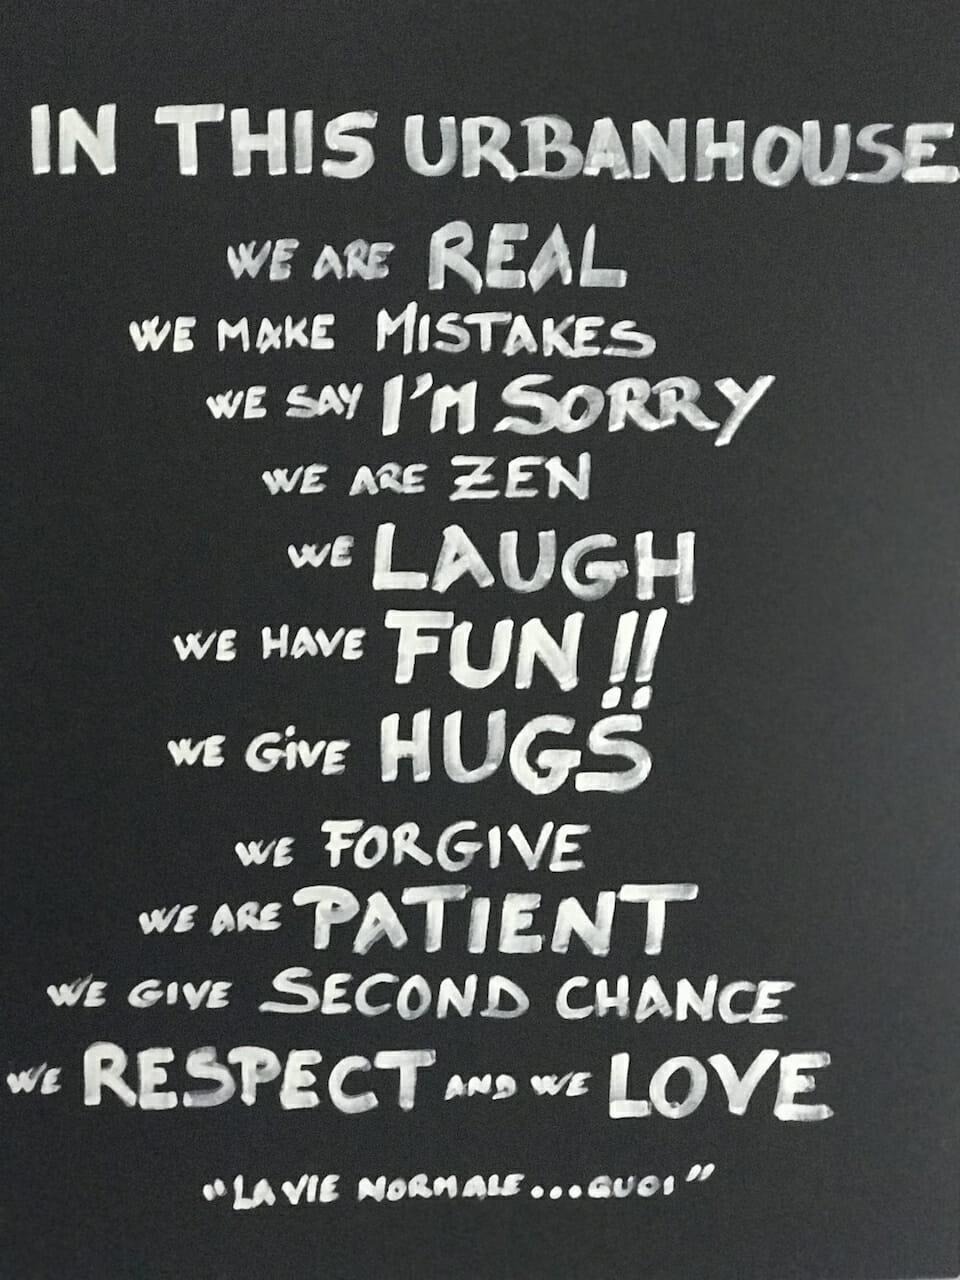 Uurbanhouse360 - Charte - We are